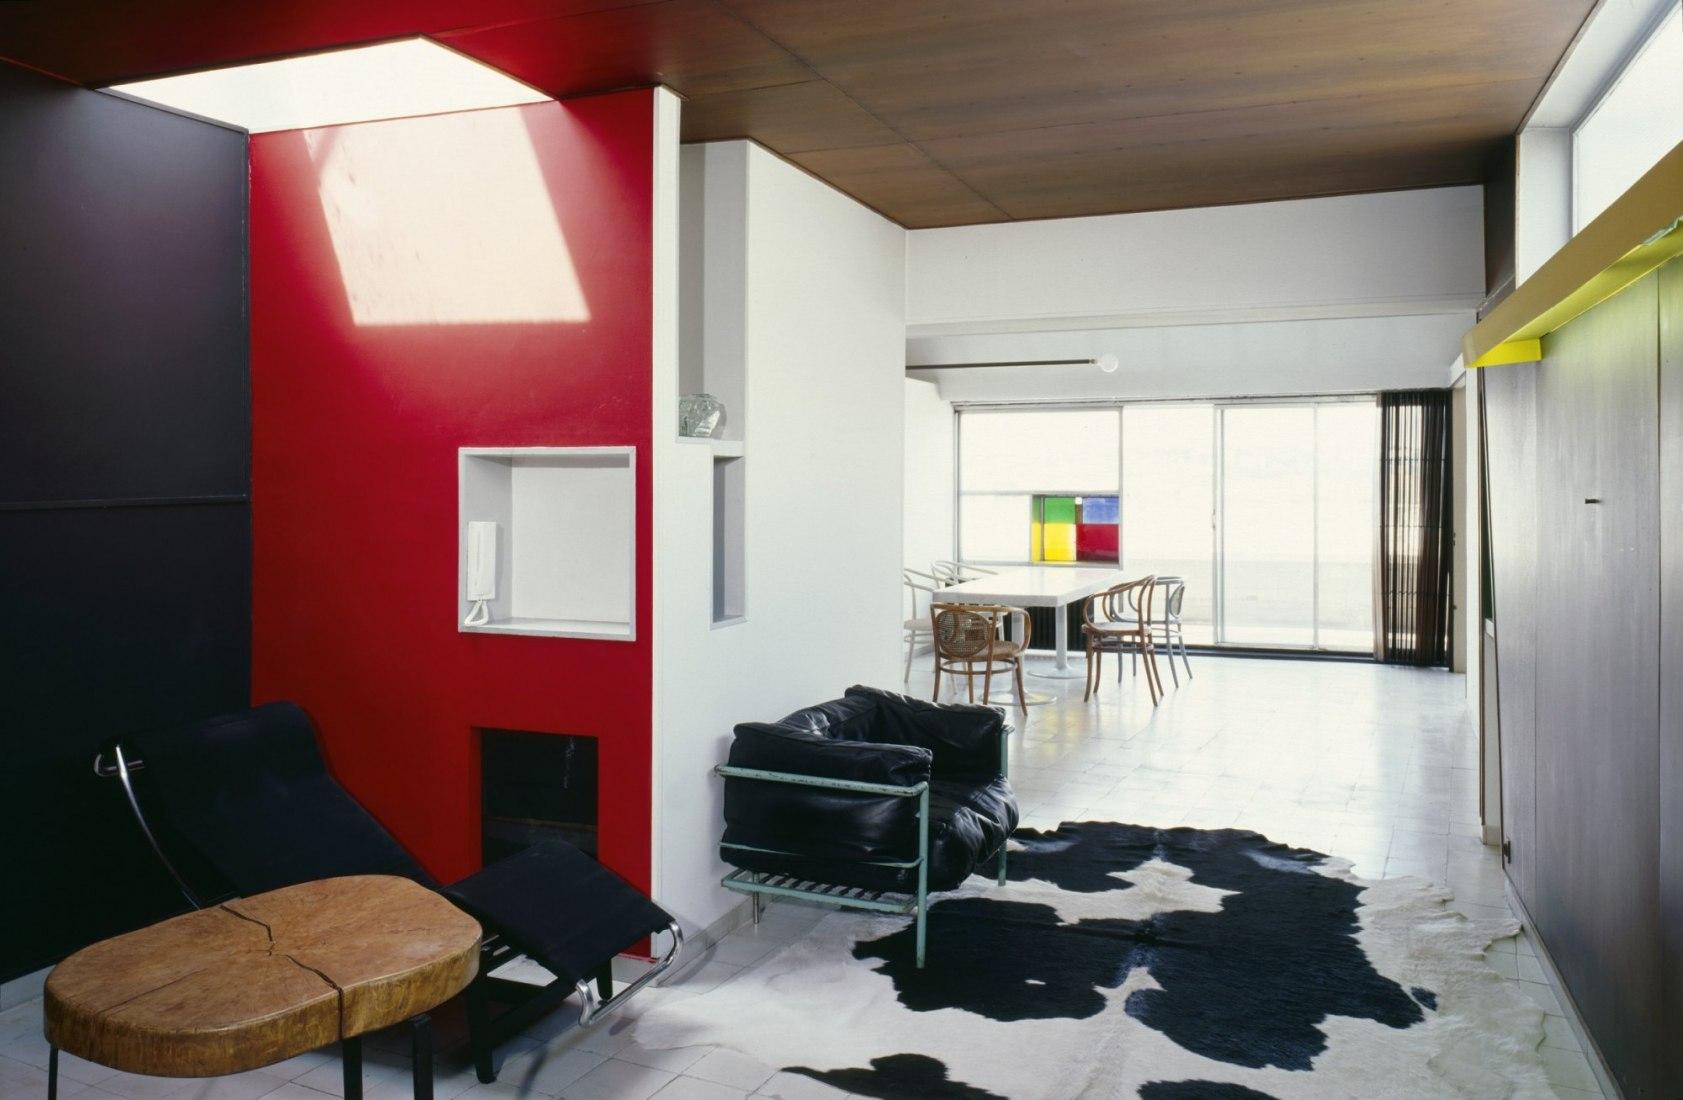 Le Corbusier's apartment. Photograph © Olivier Martin-Gambier 2005. Foundation Le Corbusier.